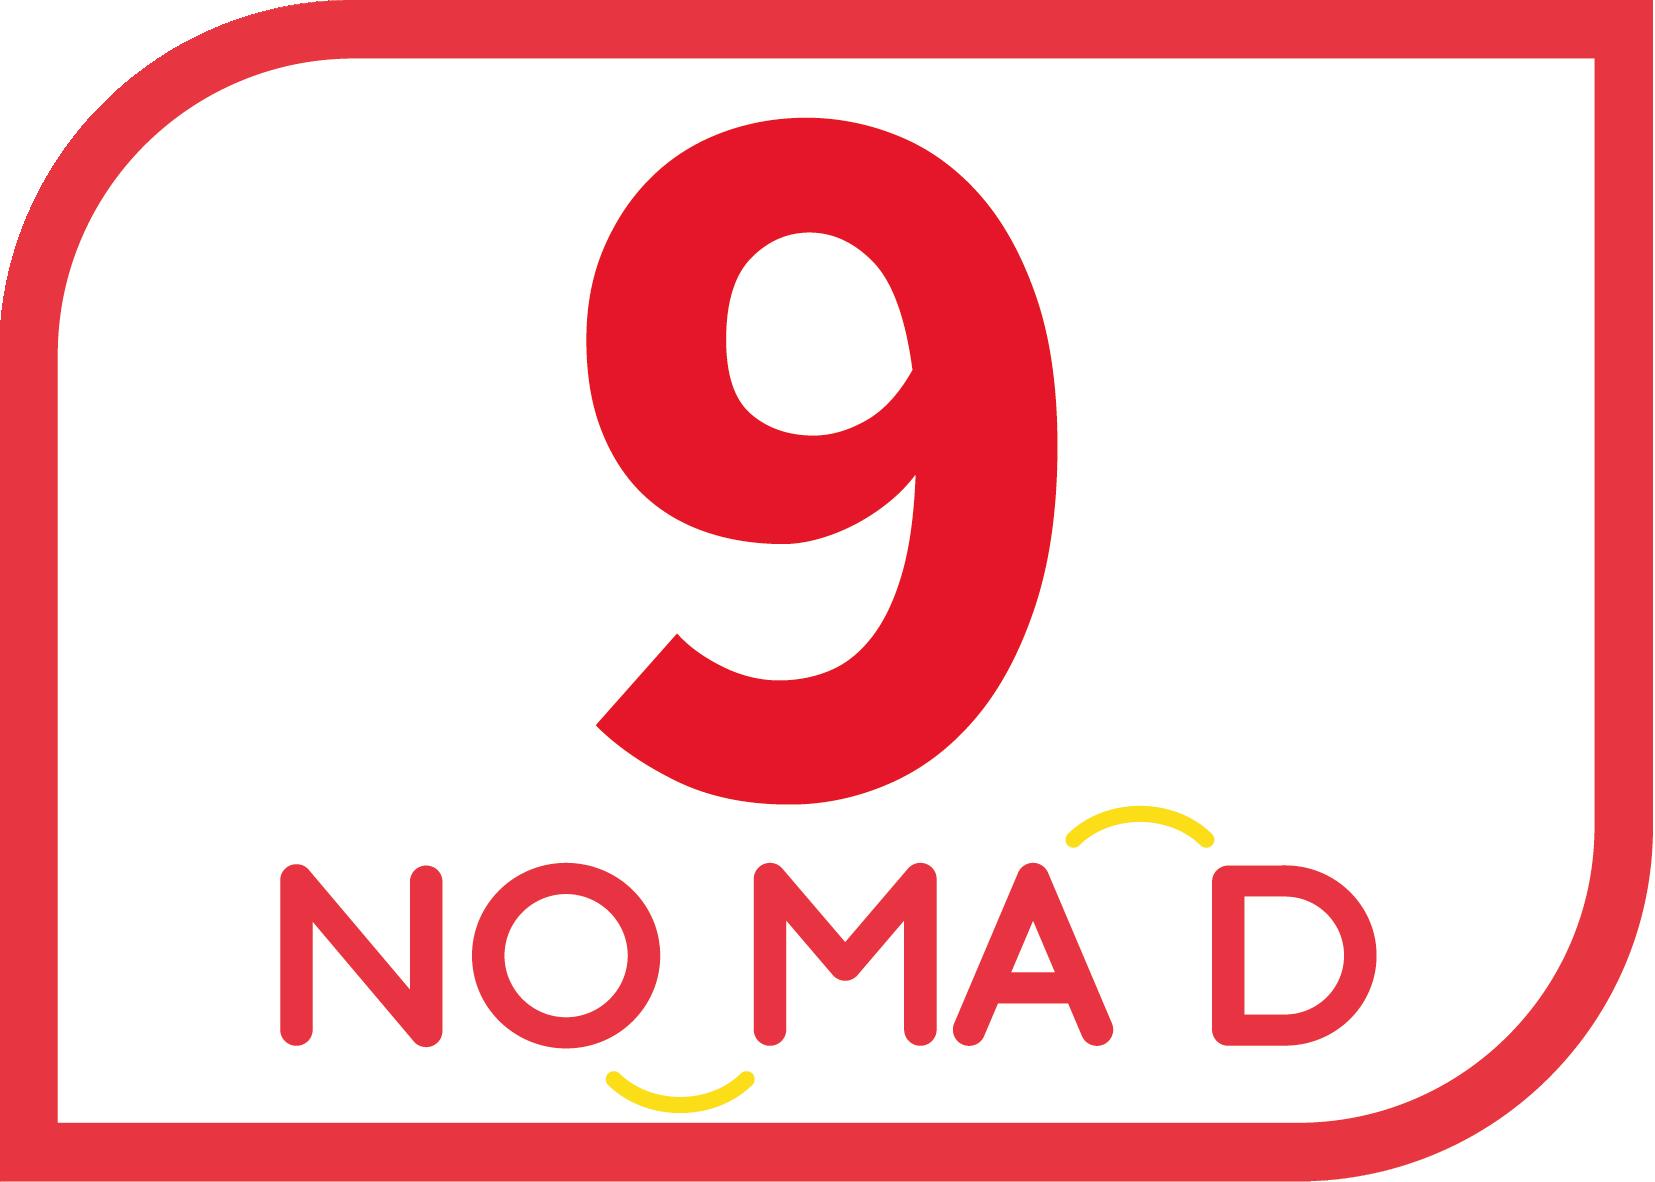 Ligne Nomad 9